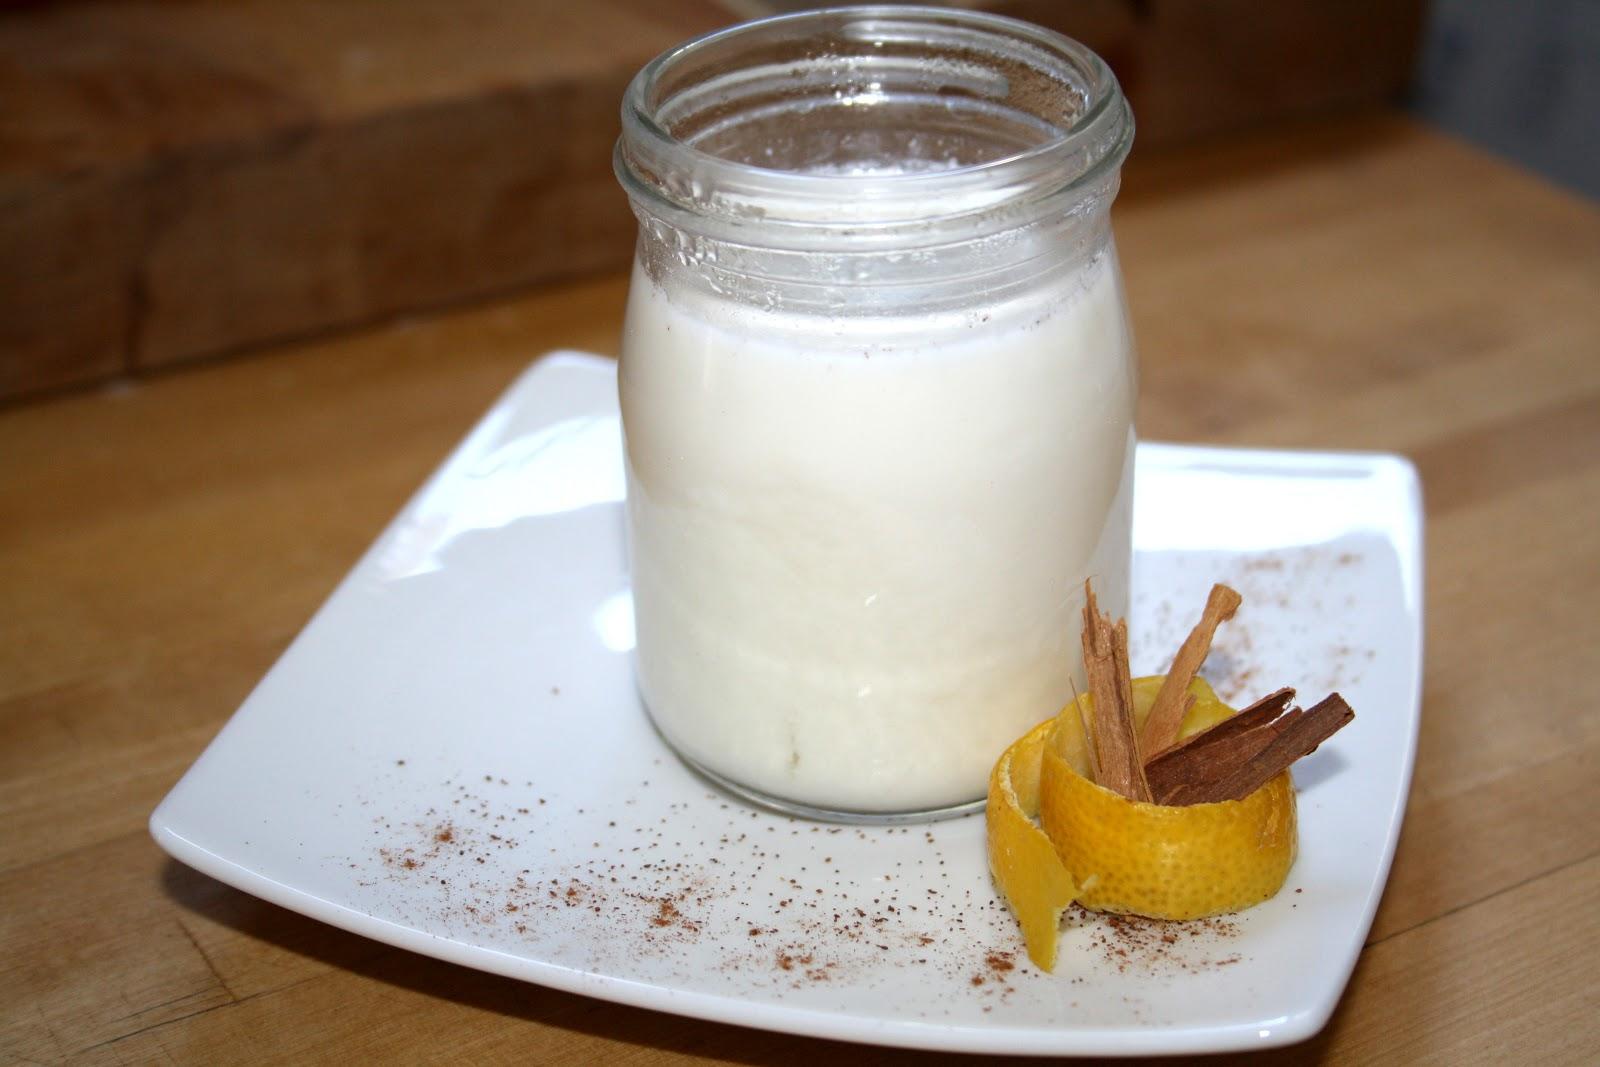 Leche merengada, leche y canela